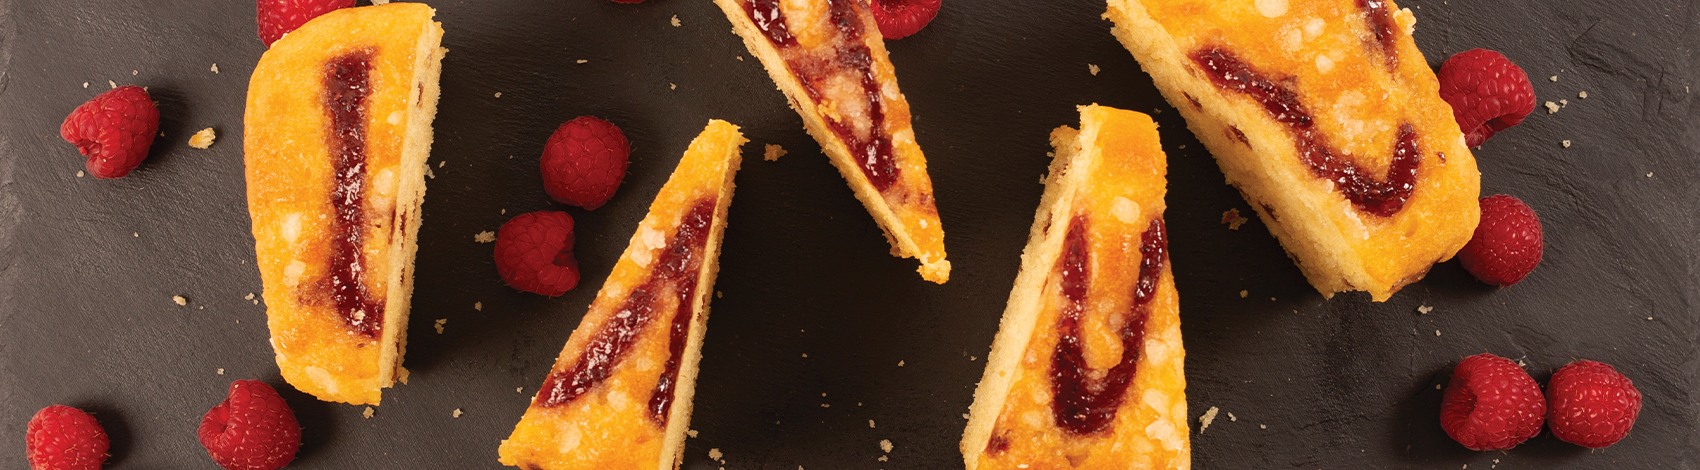 berry fizz cake banner